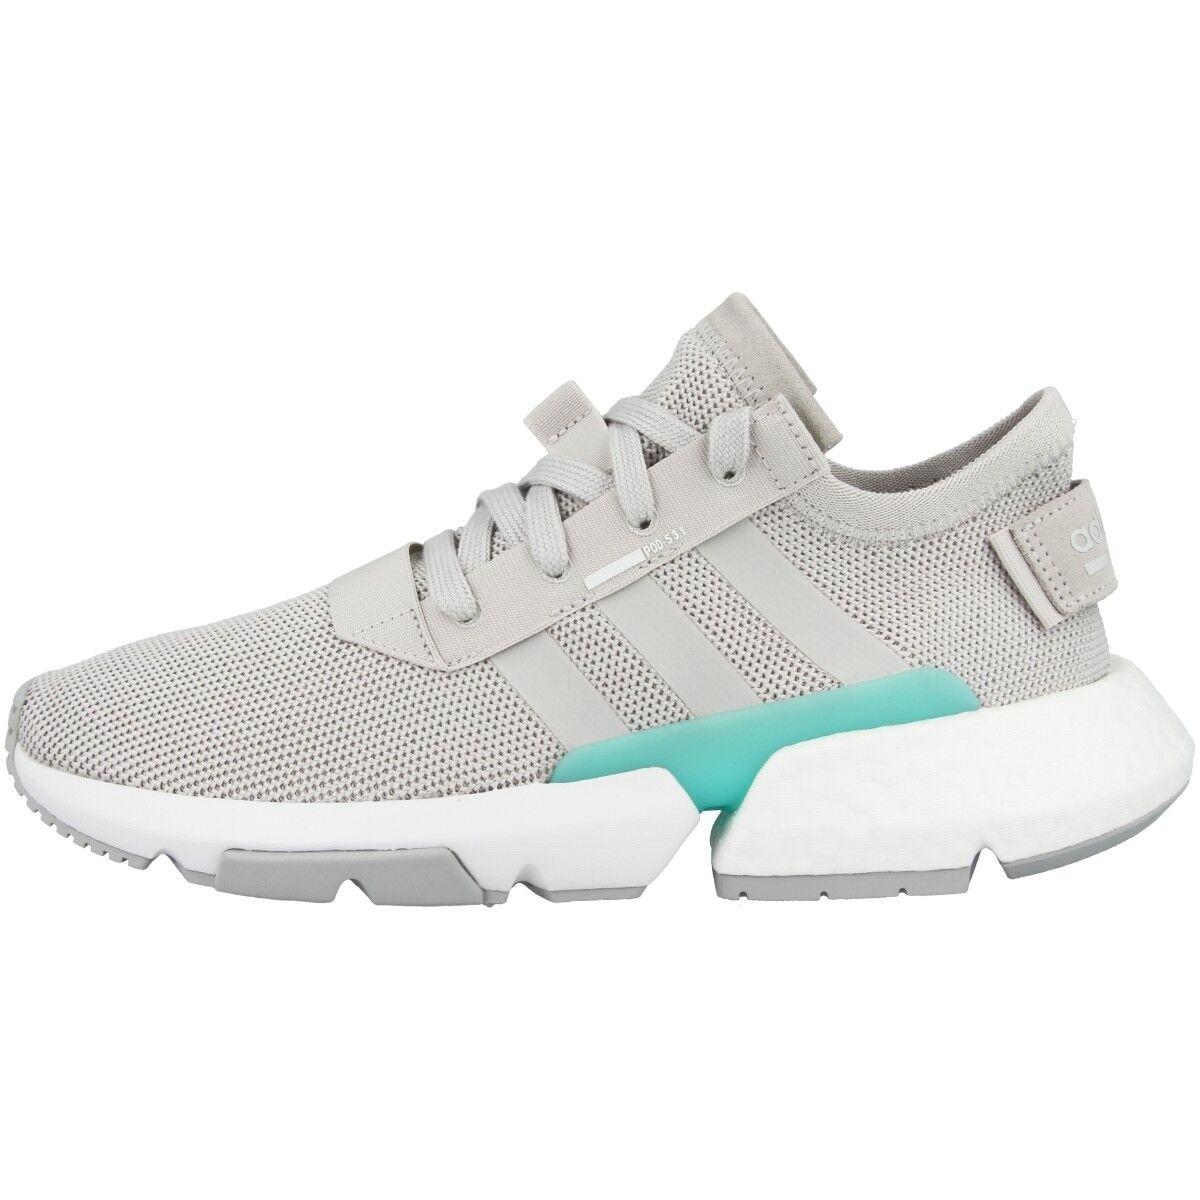 Adidas pod-s3.1 mujer zapatos señora casual zapatillas deporte gris clear Mint b37458